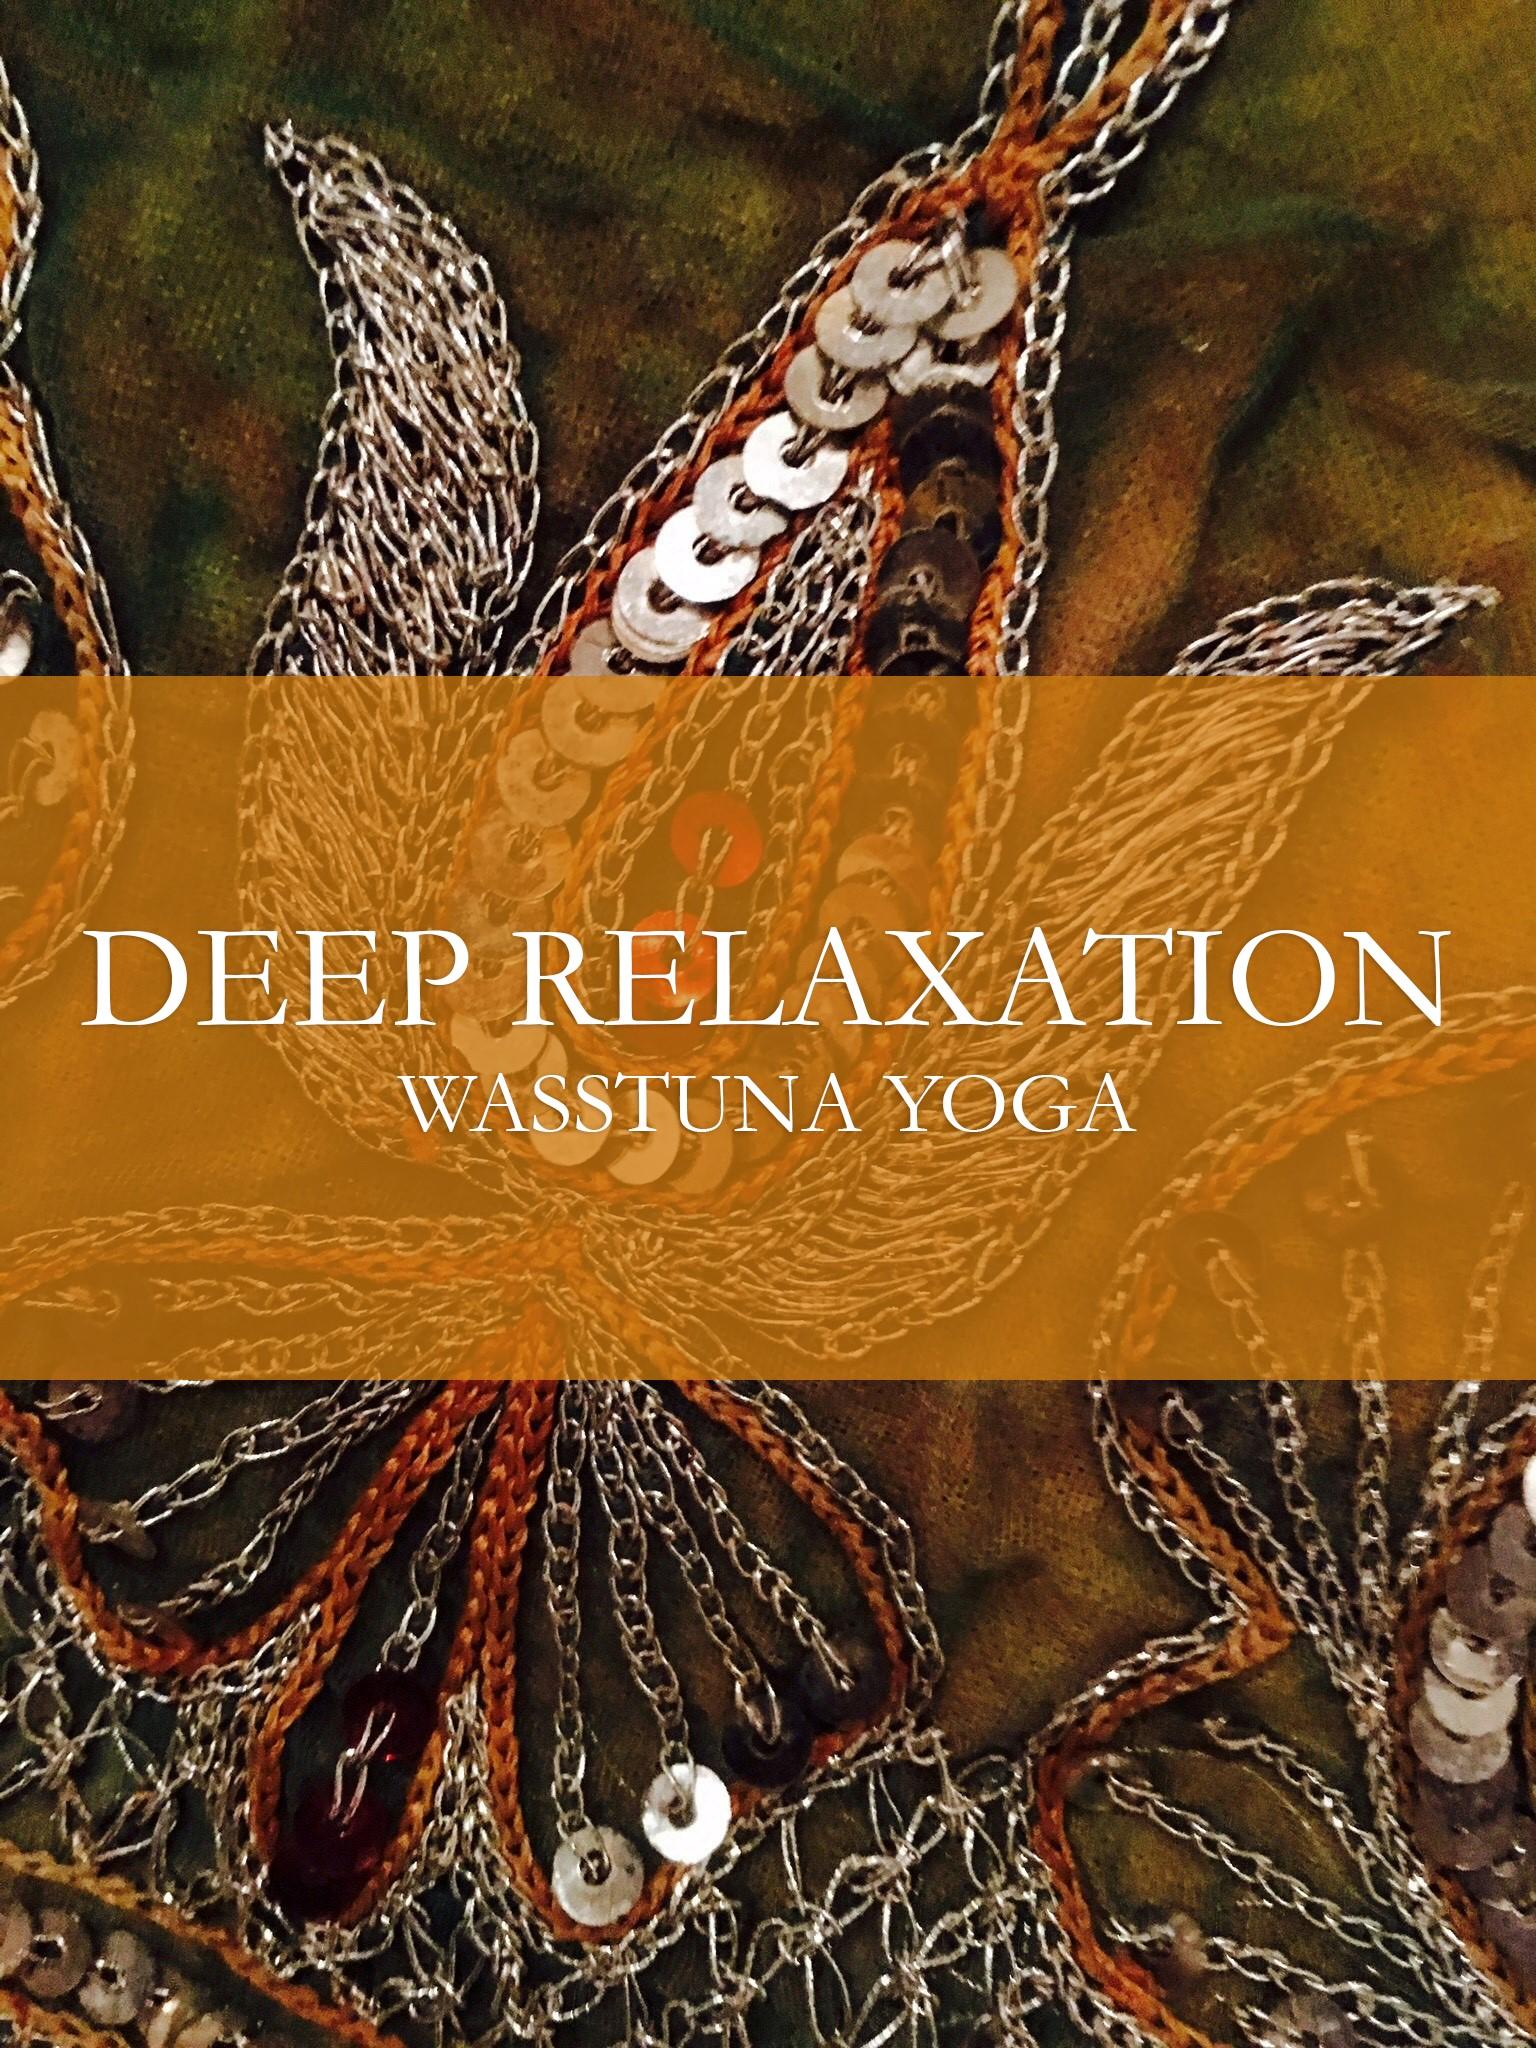 Deep Relaxation 1.jpg